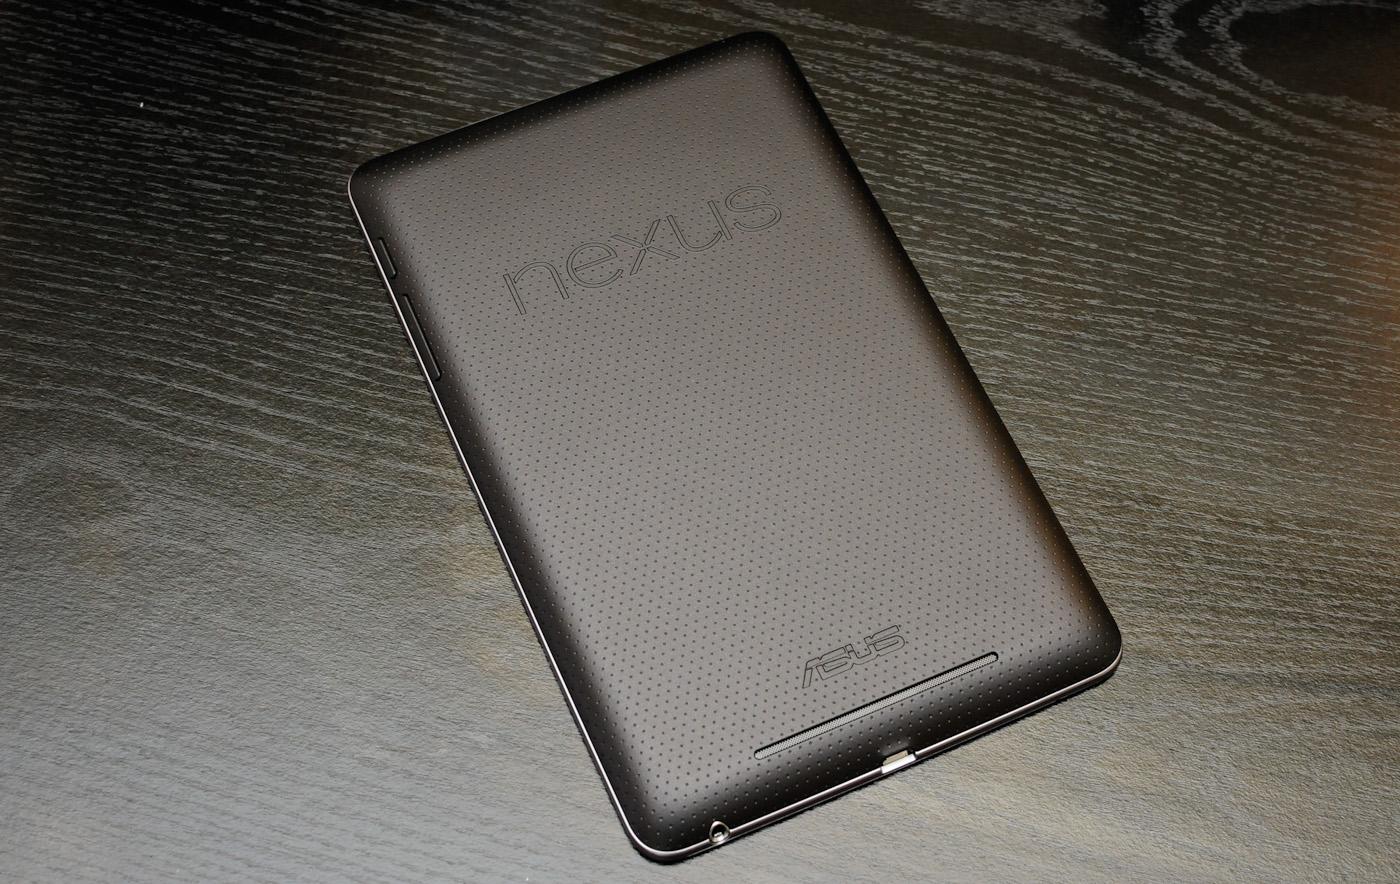 16 GB or 32 GB Asus Google Nexus 7 Android Tablet 8 GB Bundle